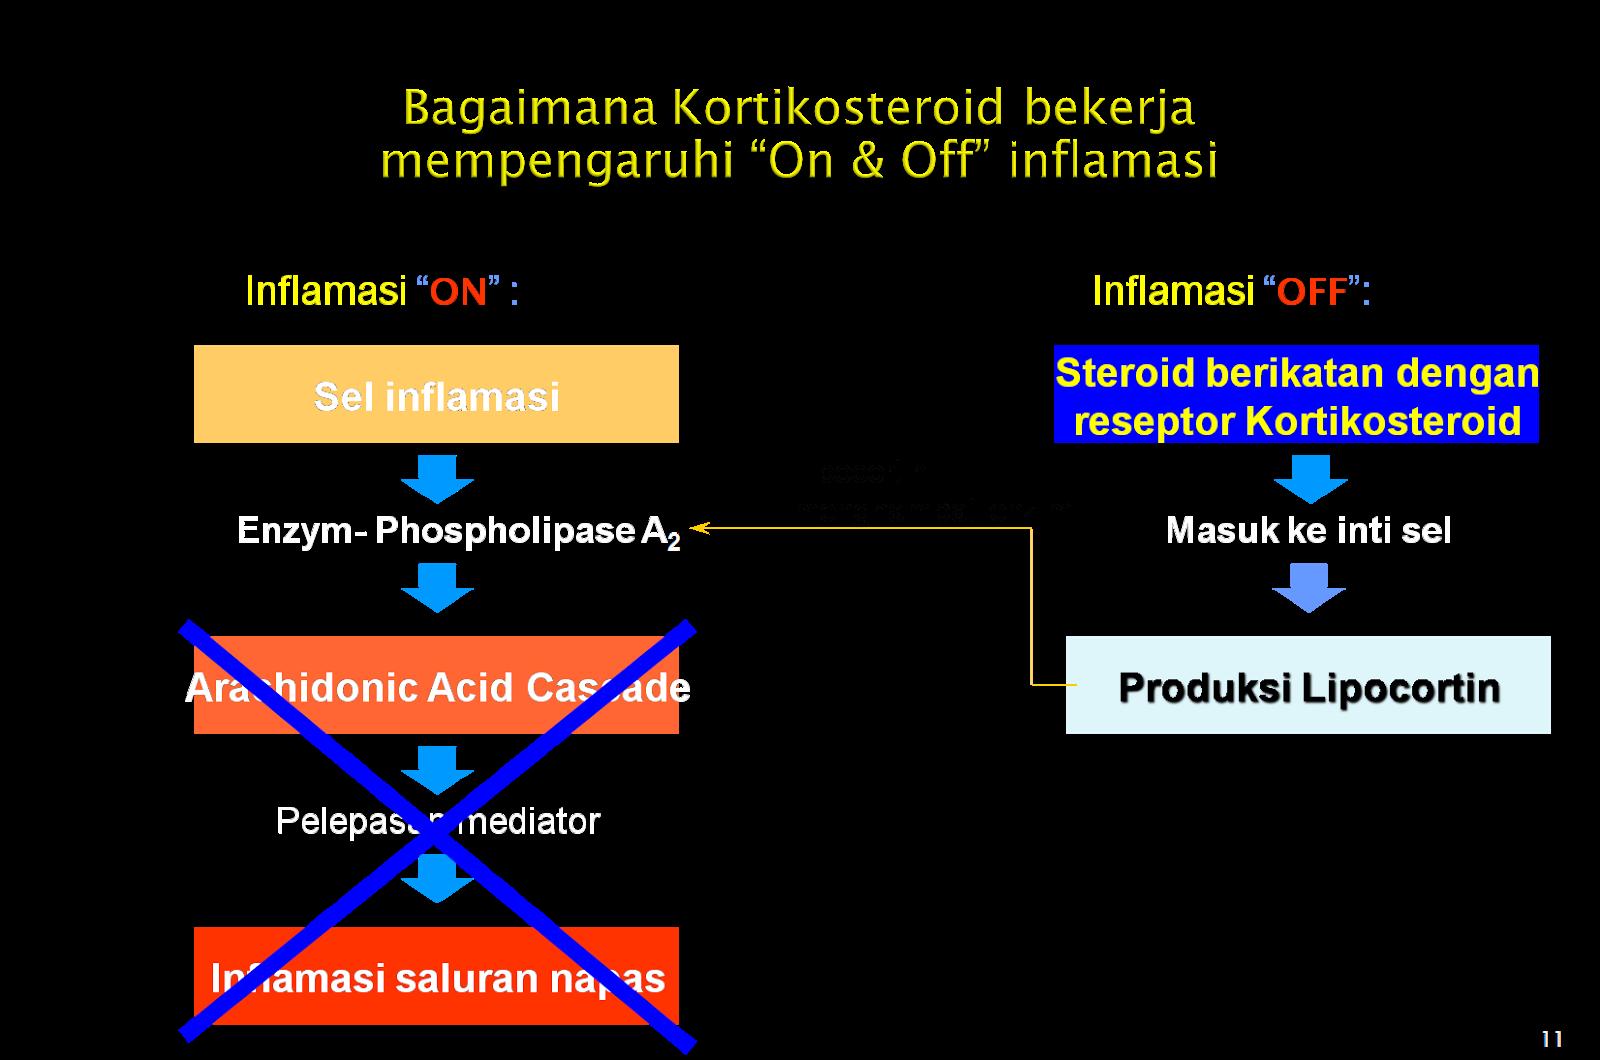 kortikosteroid inhalasi adalah